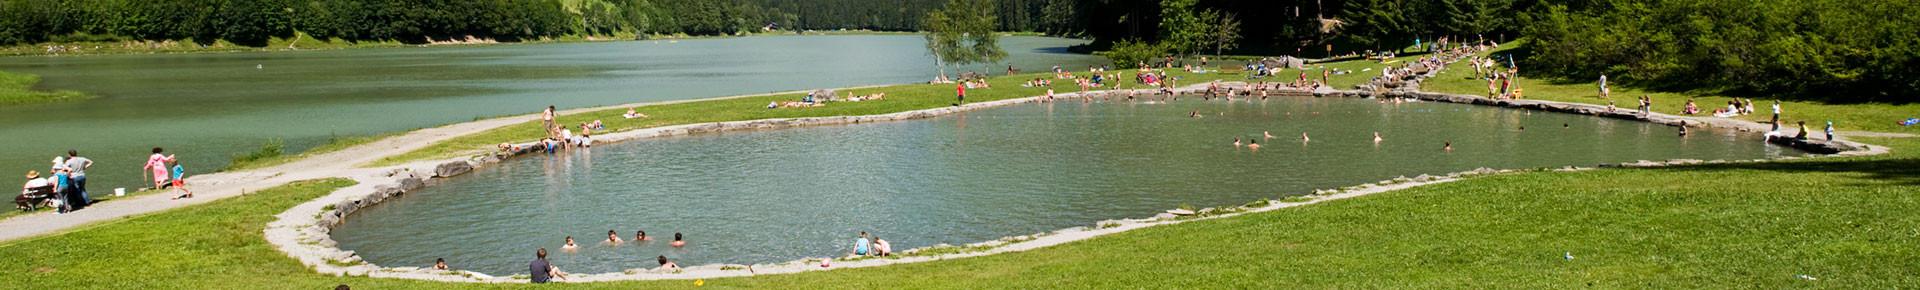 Sites de baignade en Vallée d'Aulps